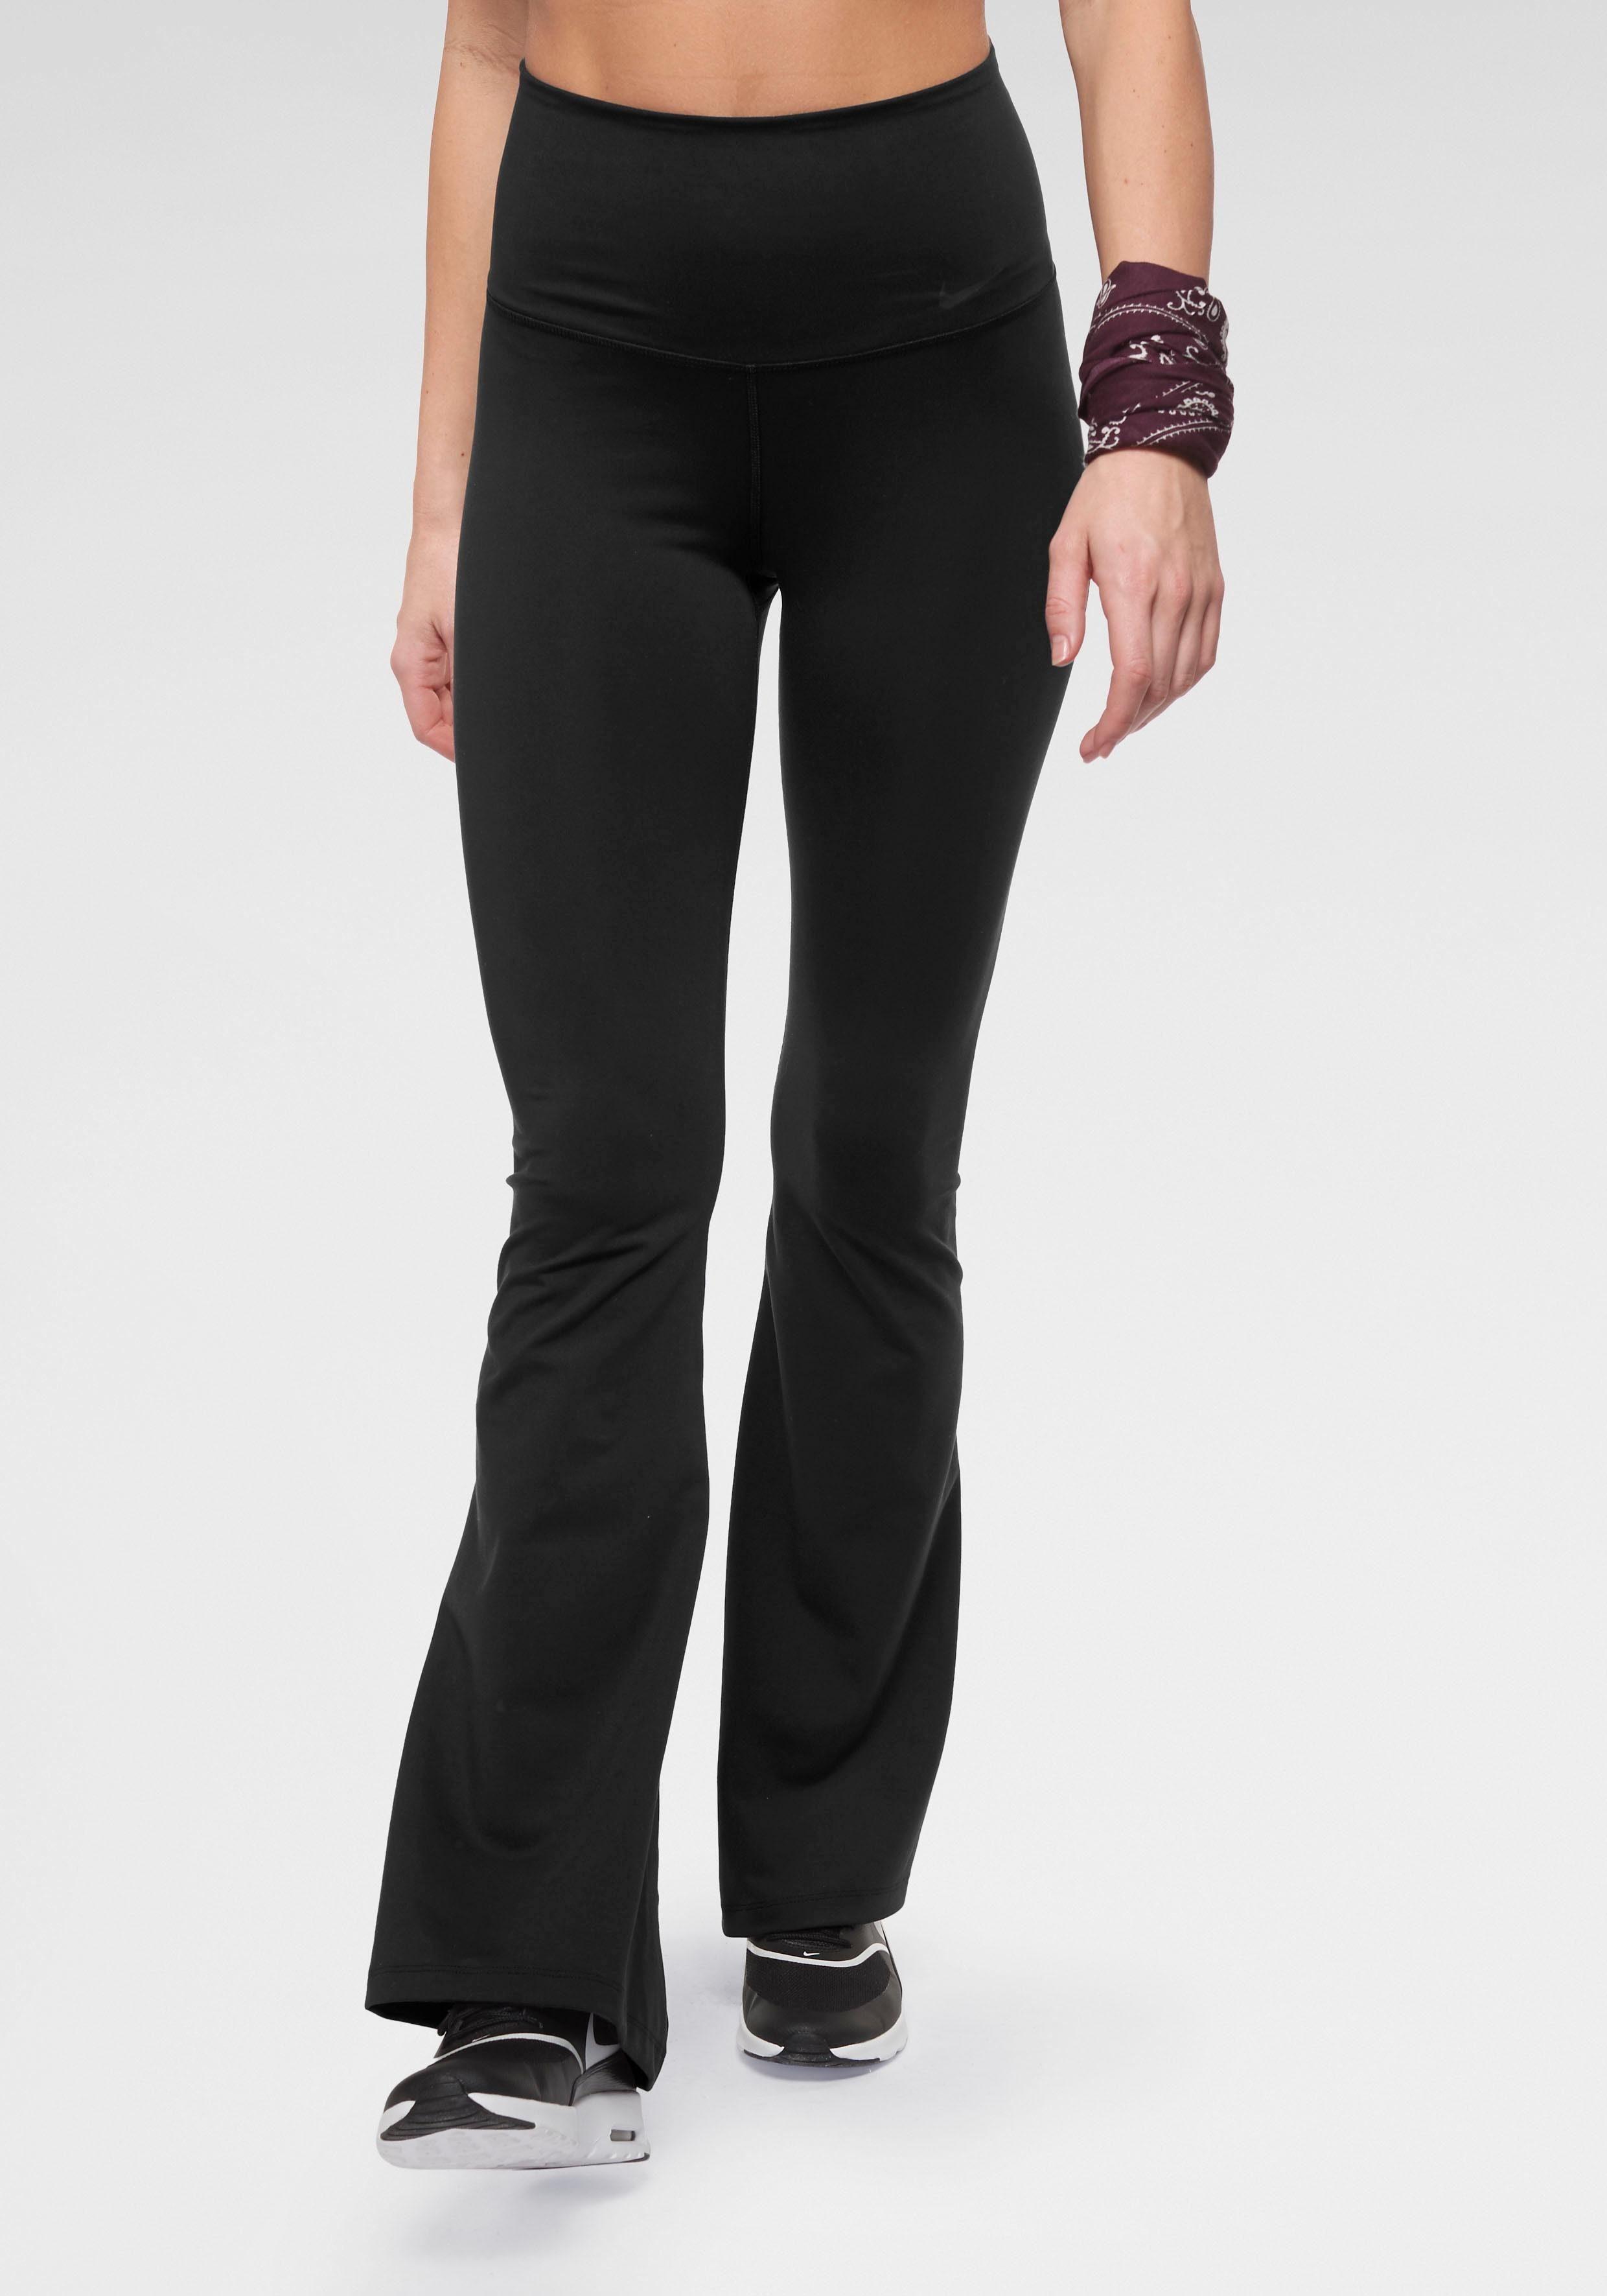 Nike Jazzpants »WOMAN POWER DRI FIT TRAINING TIGHT« online kaufen   OTTO